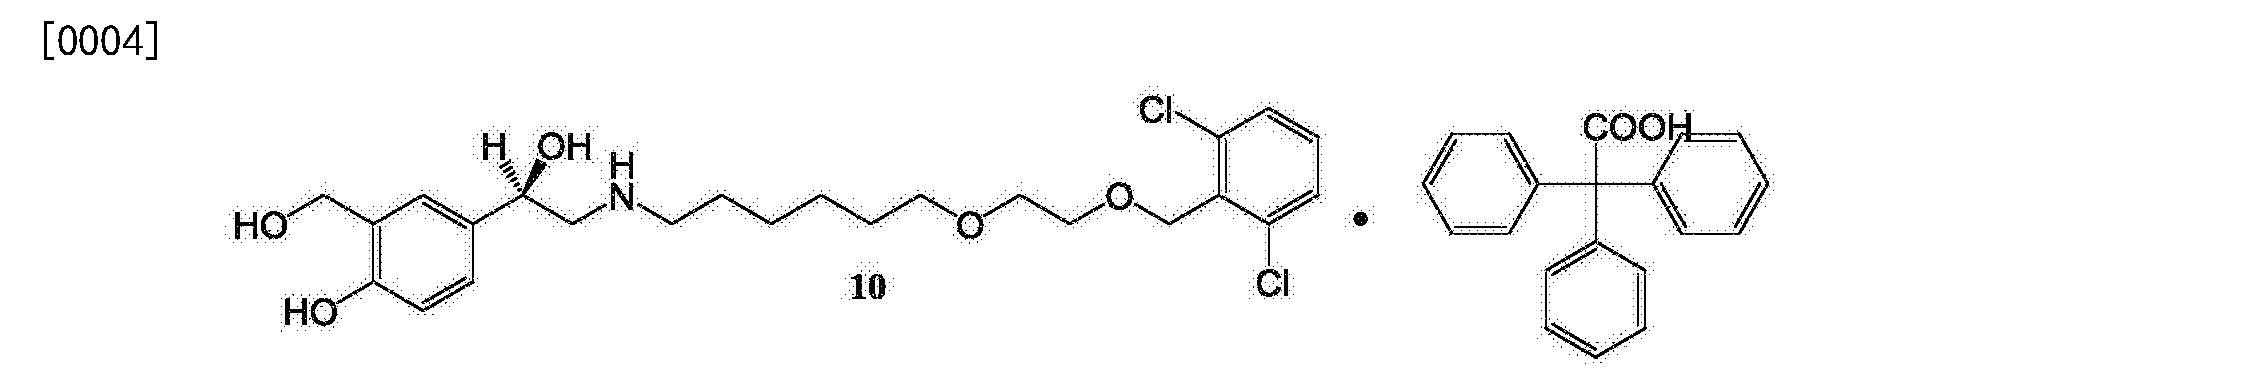 Figure CN105646285AD00041